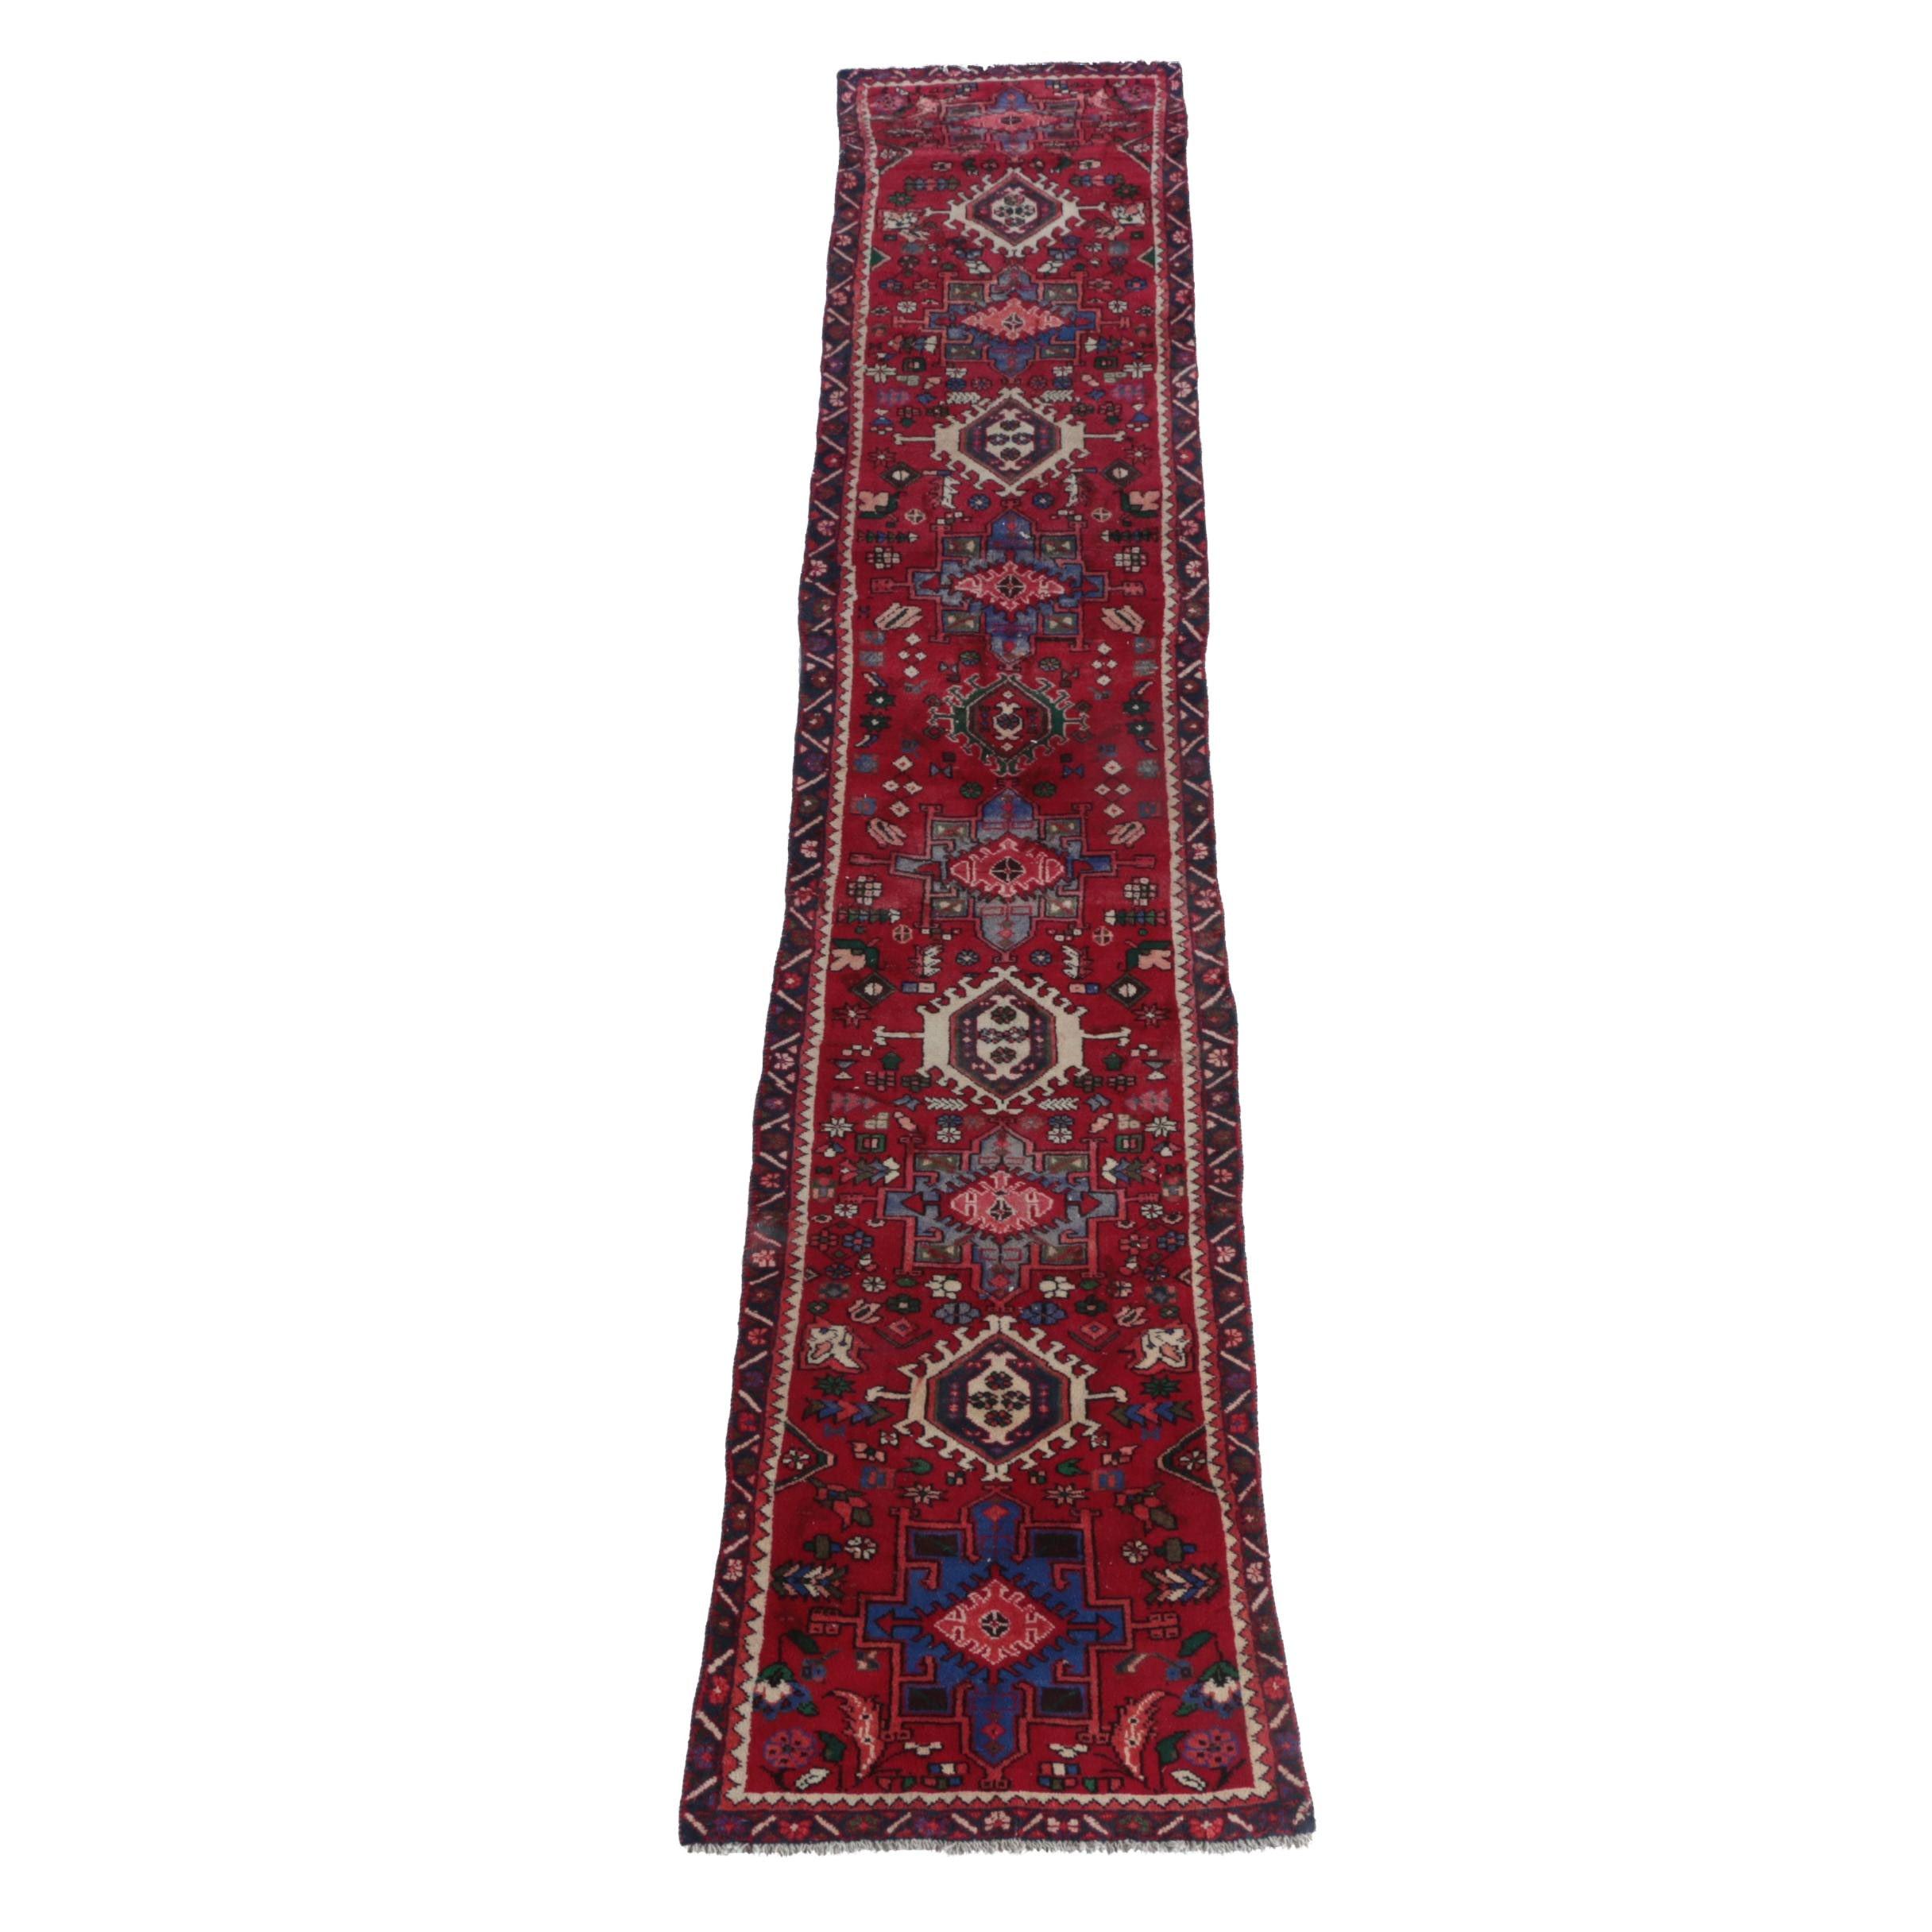 Vintage Hand-Knotted Persian Karaja Carpet Runner